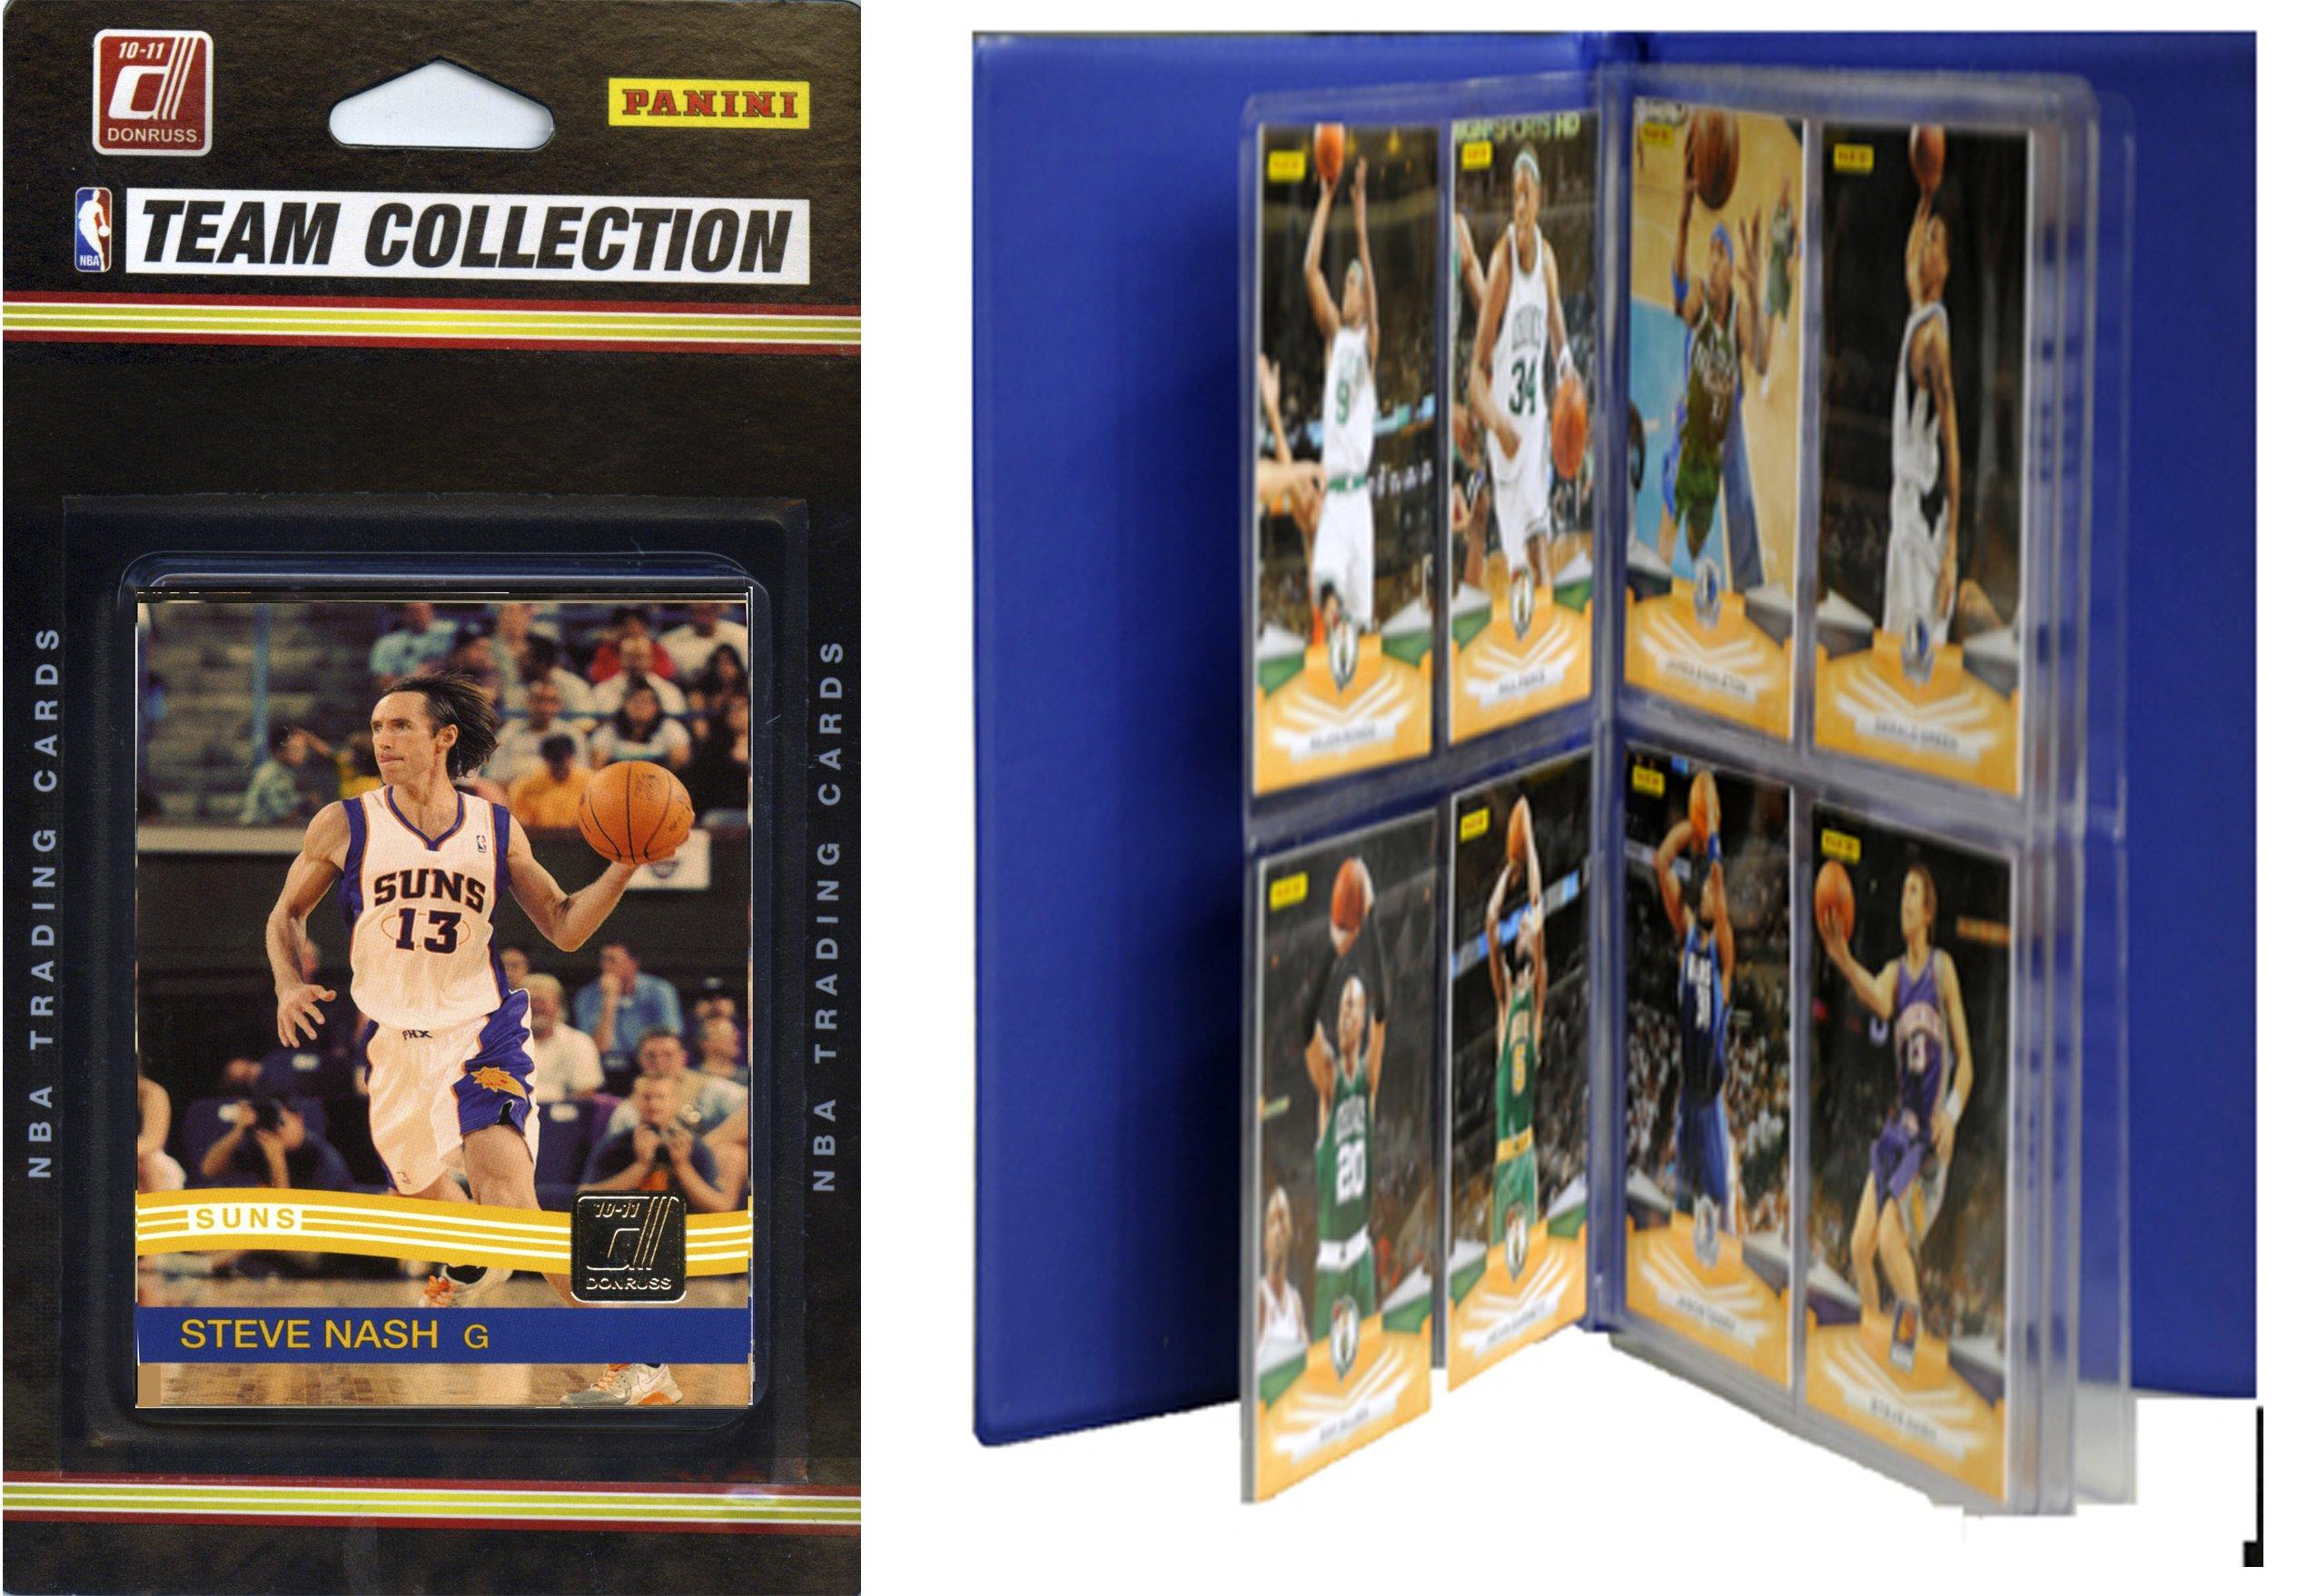 NBA Phoenix Suns Licensed 2010-11 Donruss Team Set Plus Storage Album